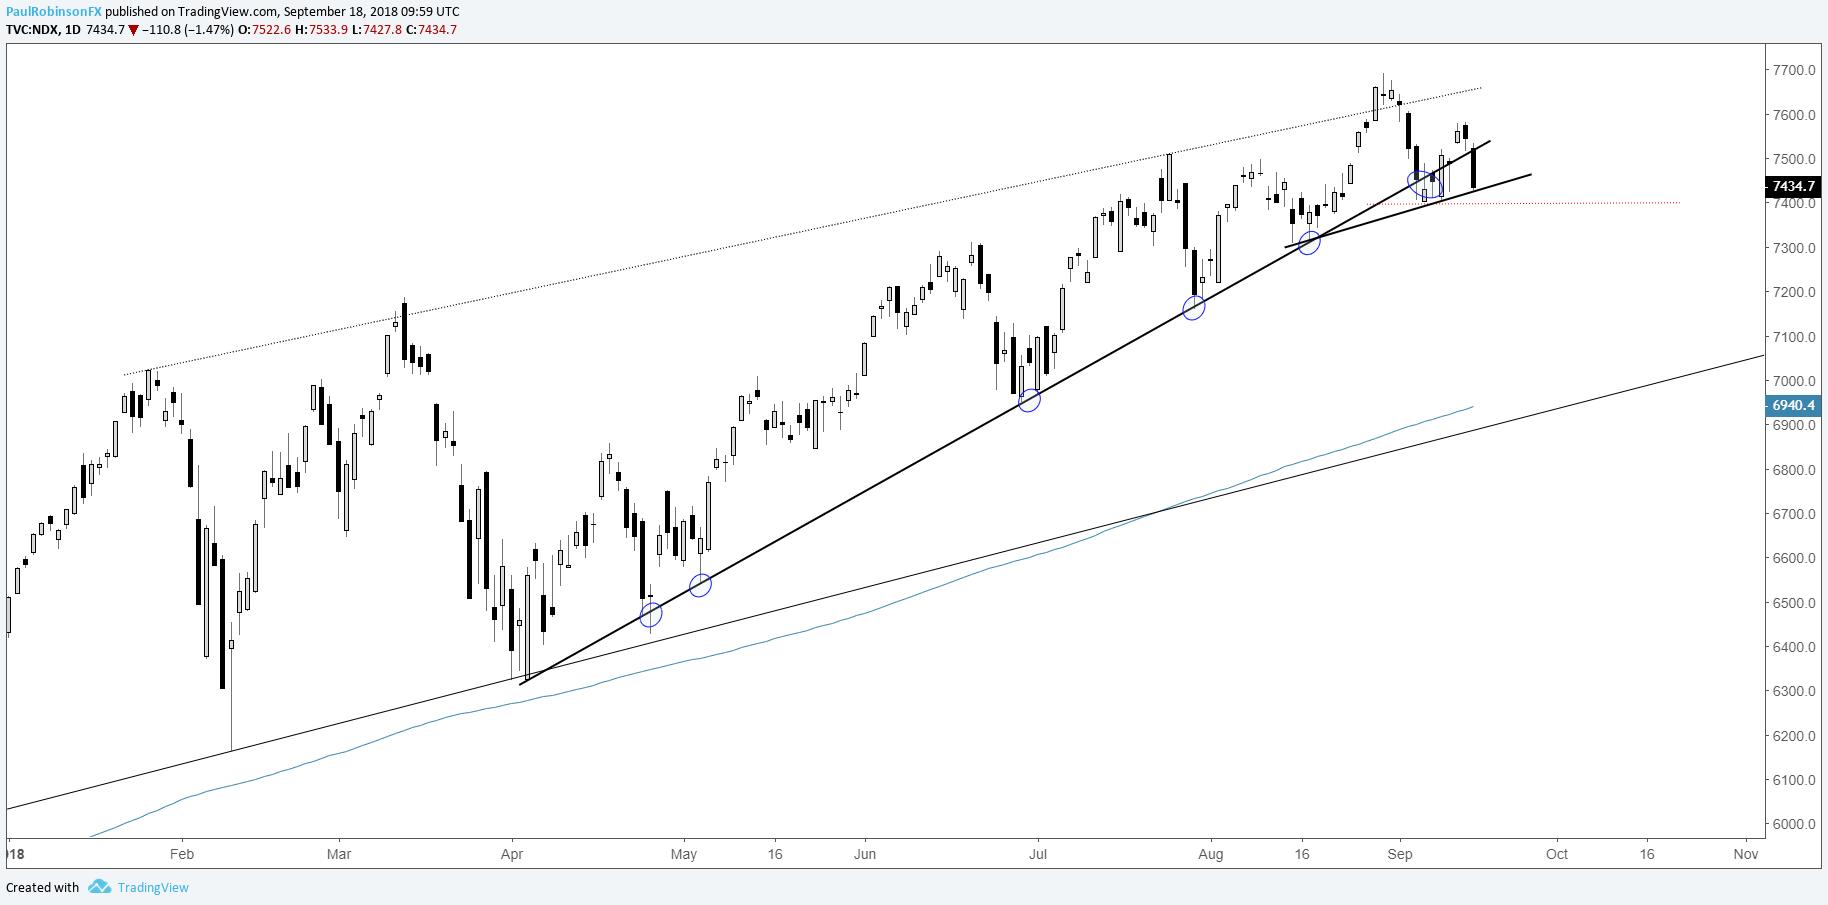 S&p trading signals